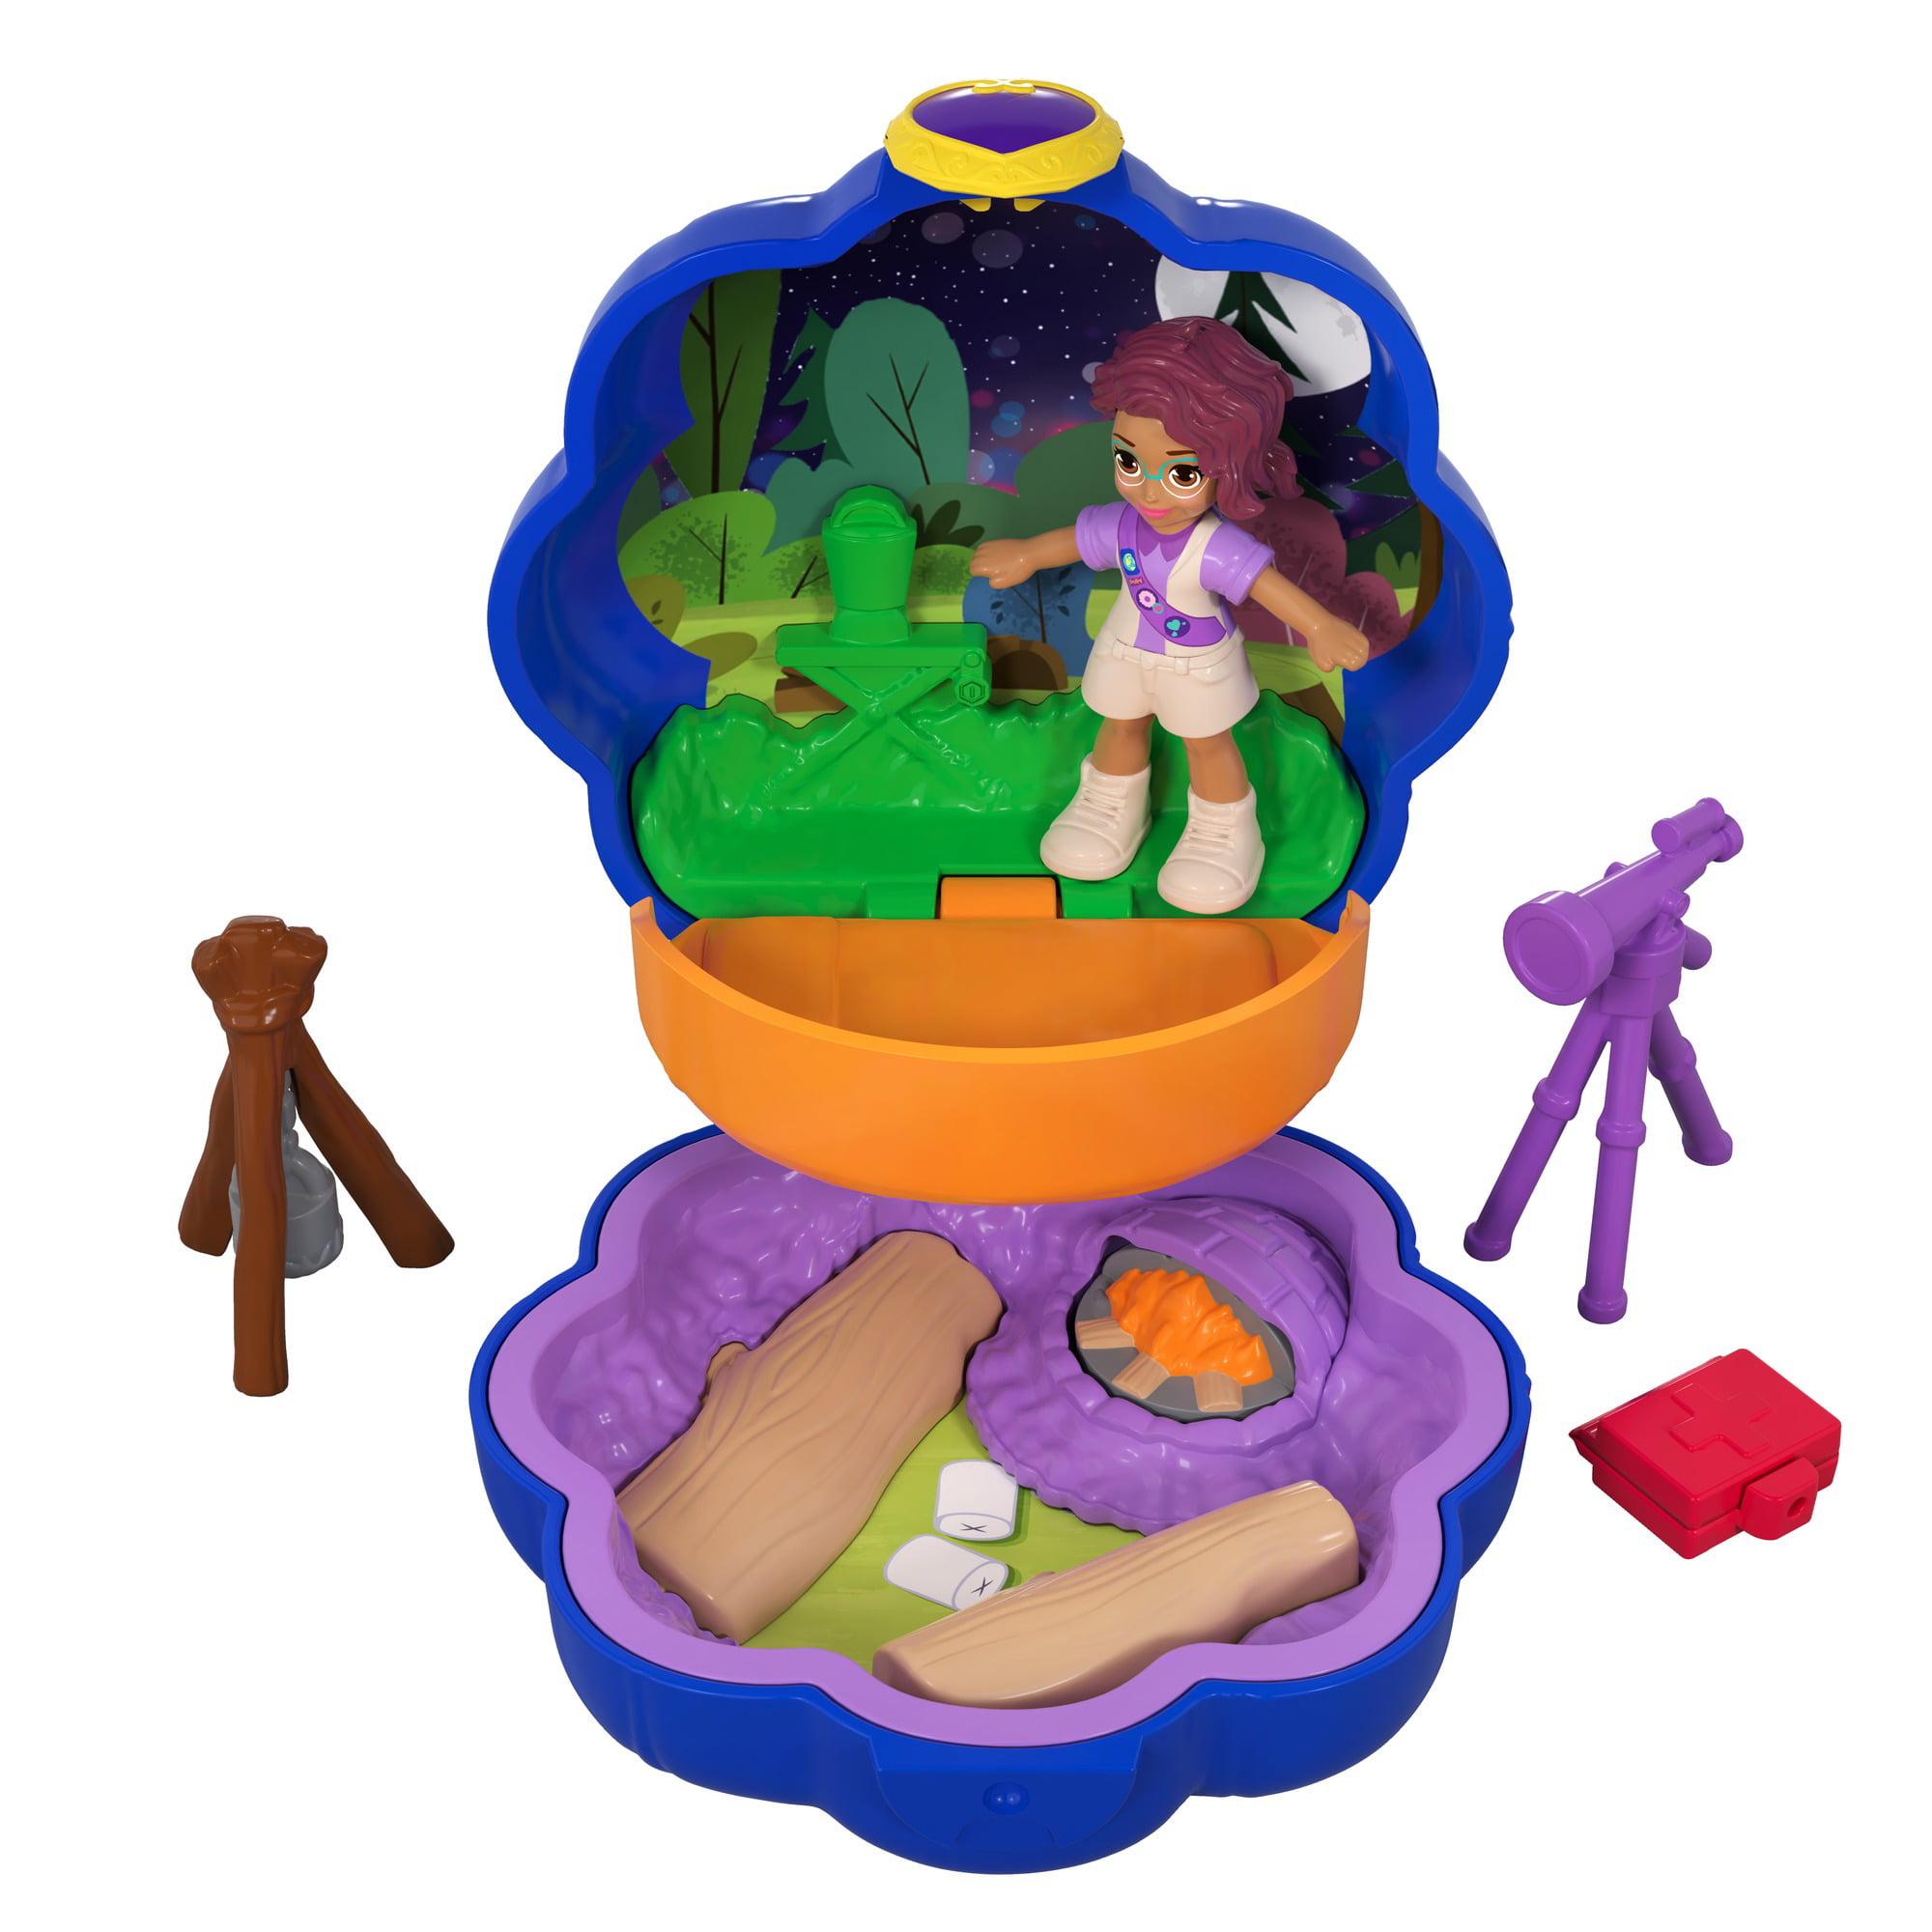 Polly Pocket Tiny Pocket Places Picnic Compact with Shani Doll